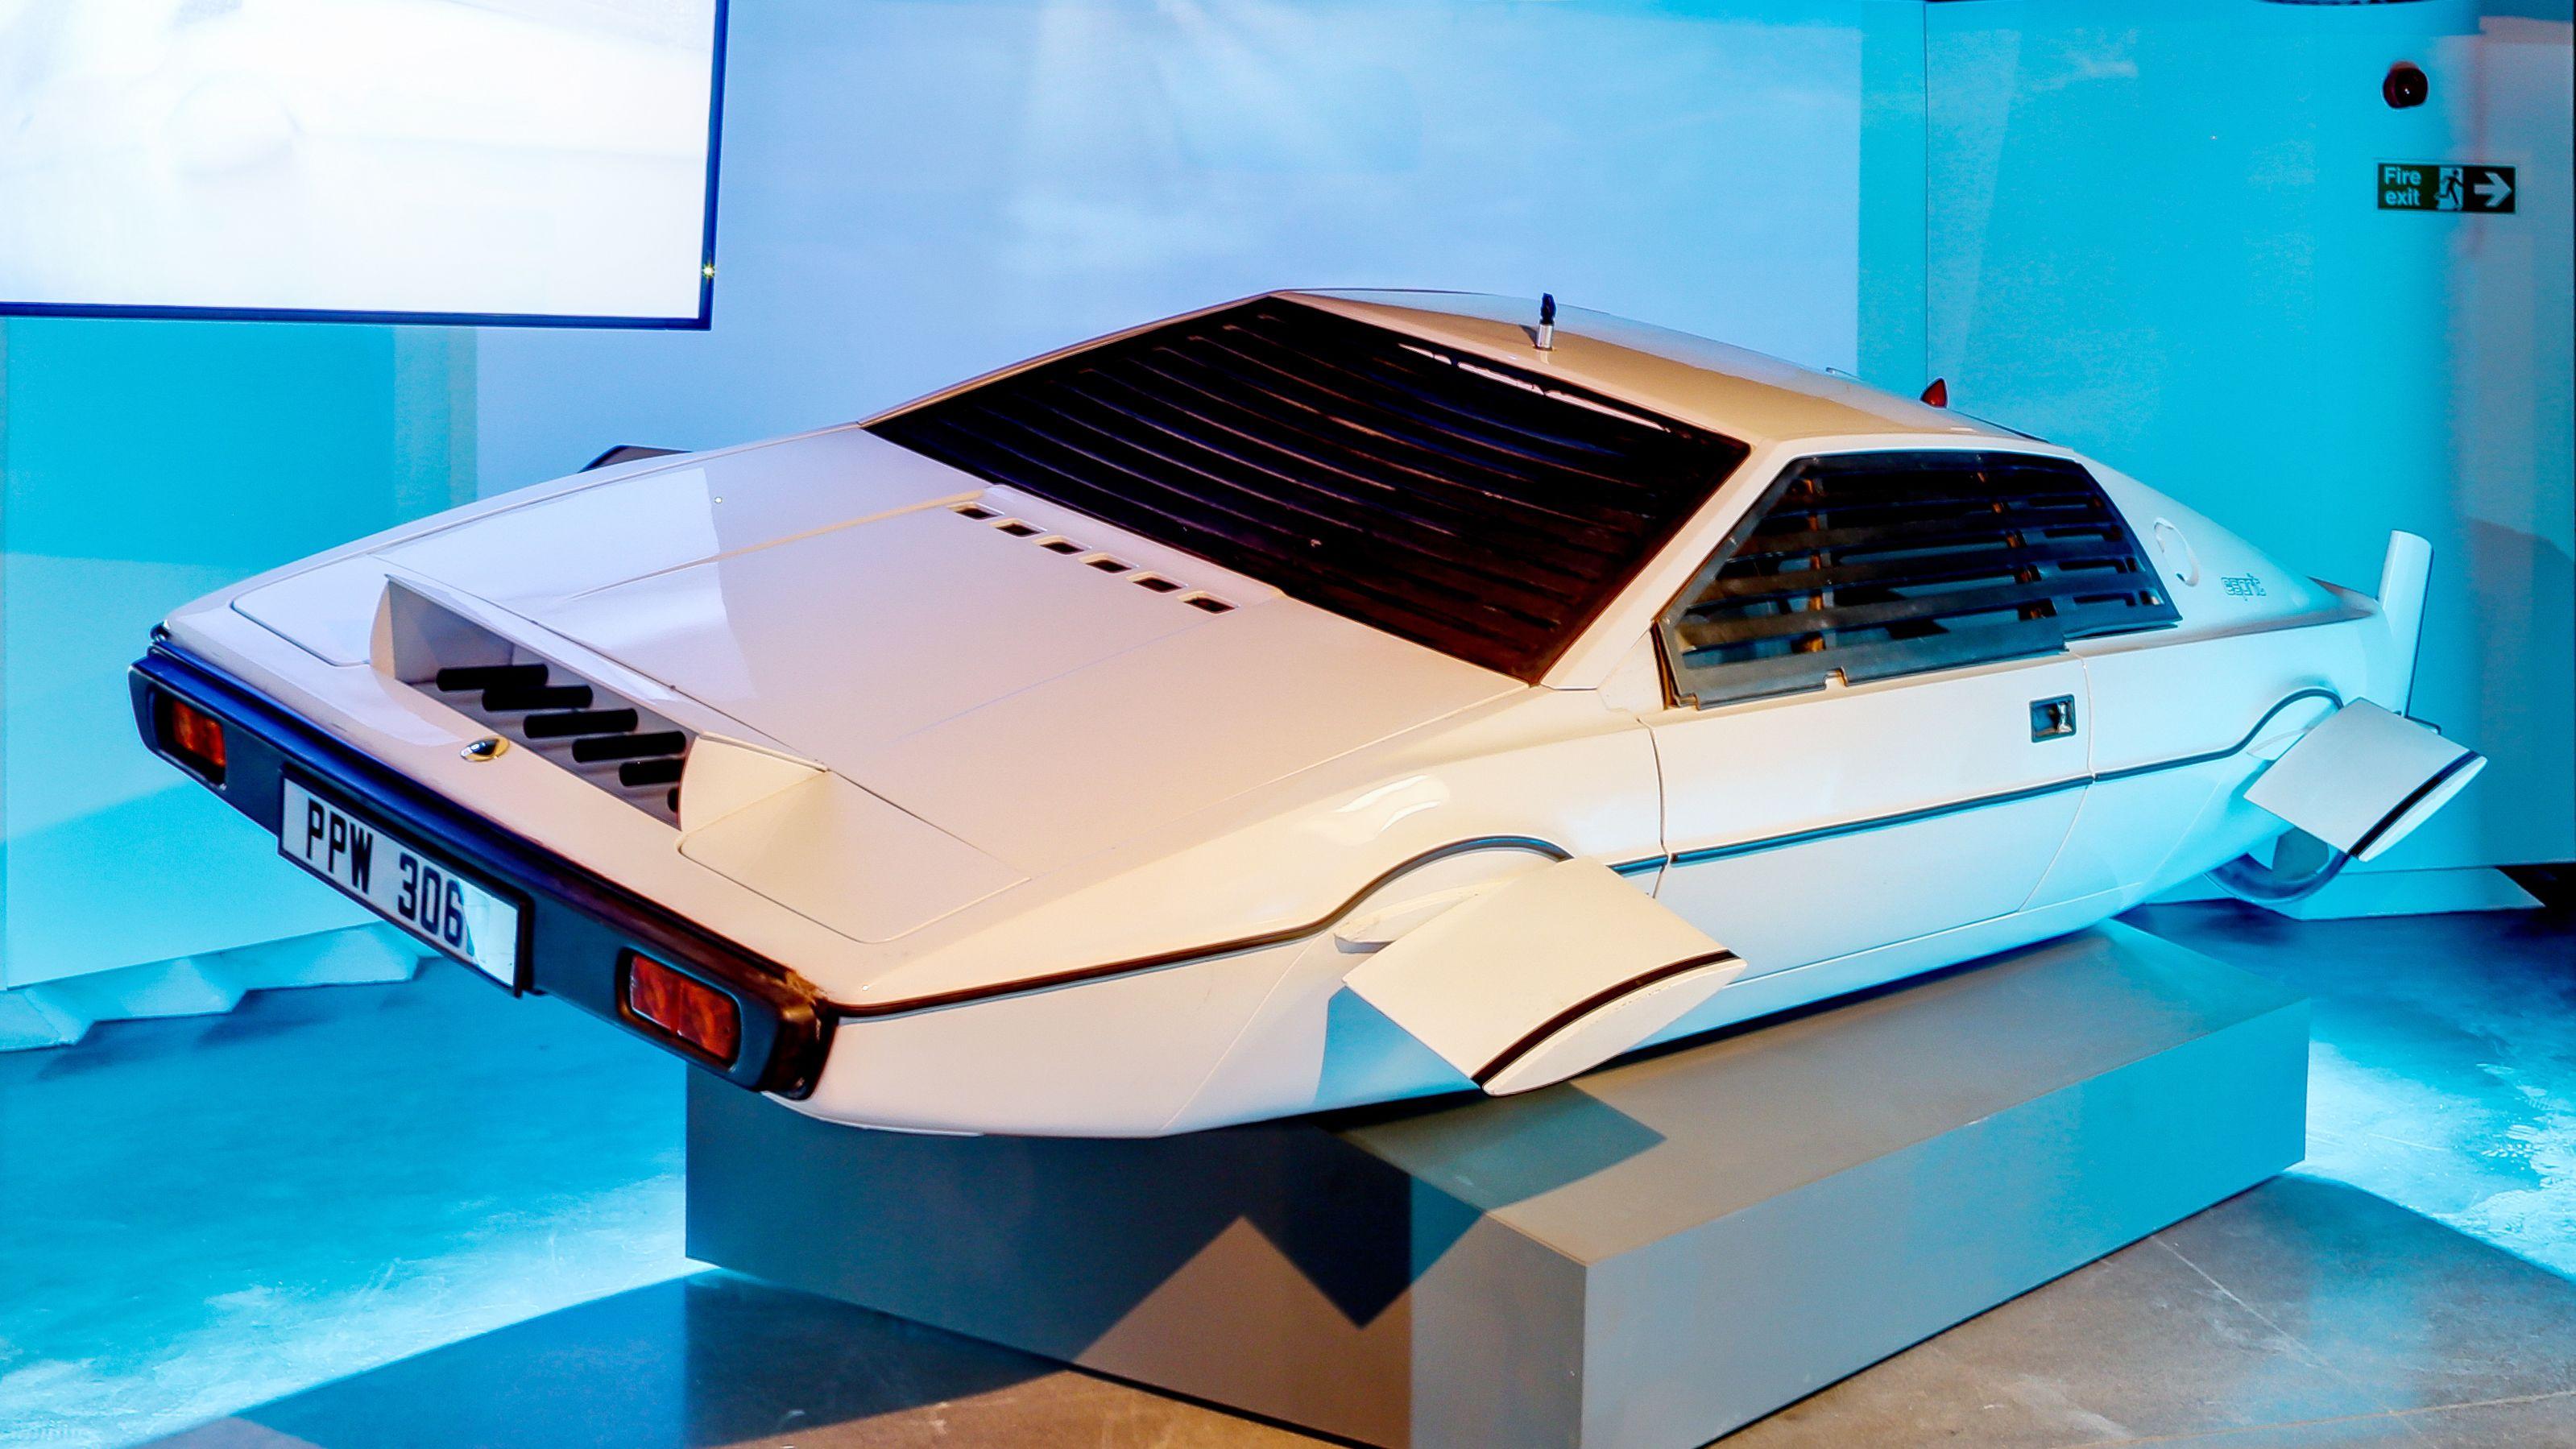 futuristic sports car on display at London Film Museum